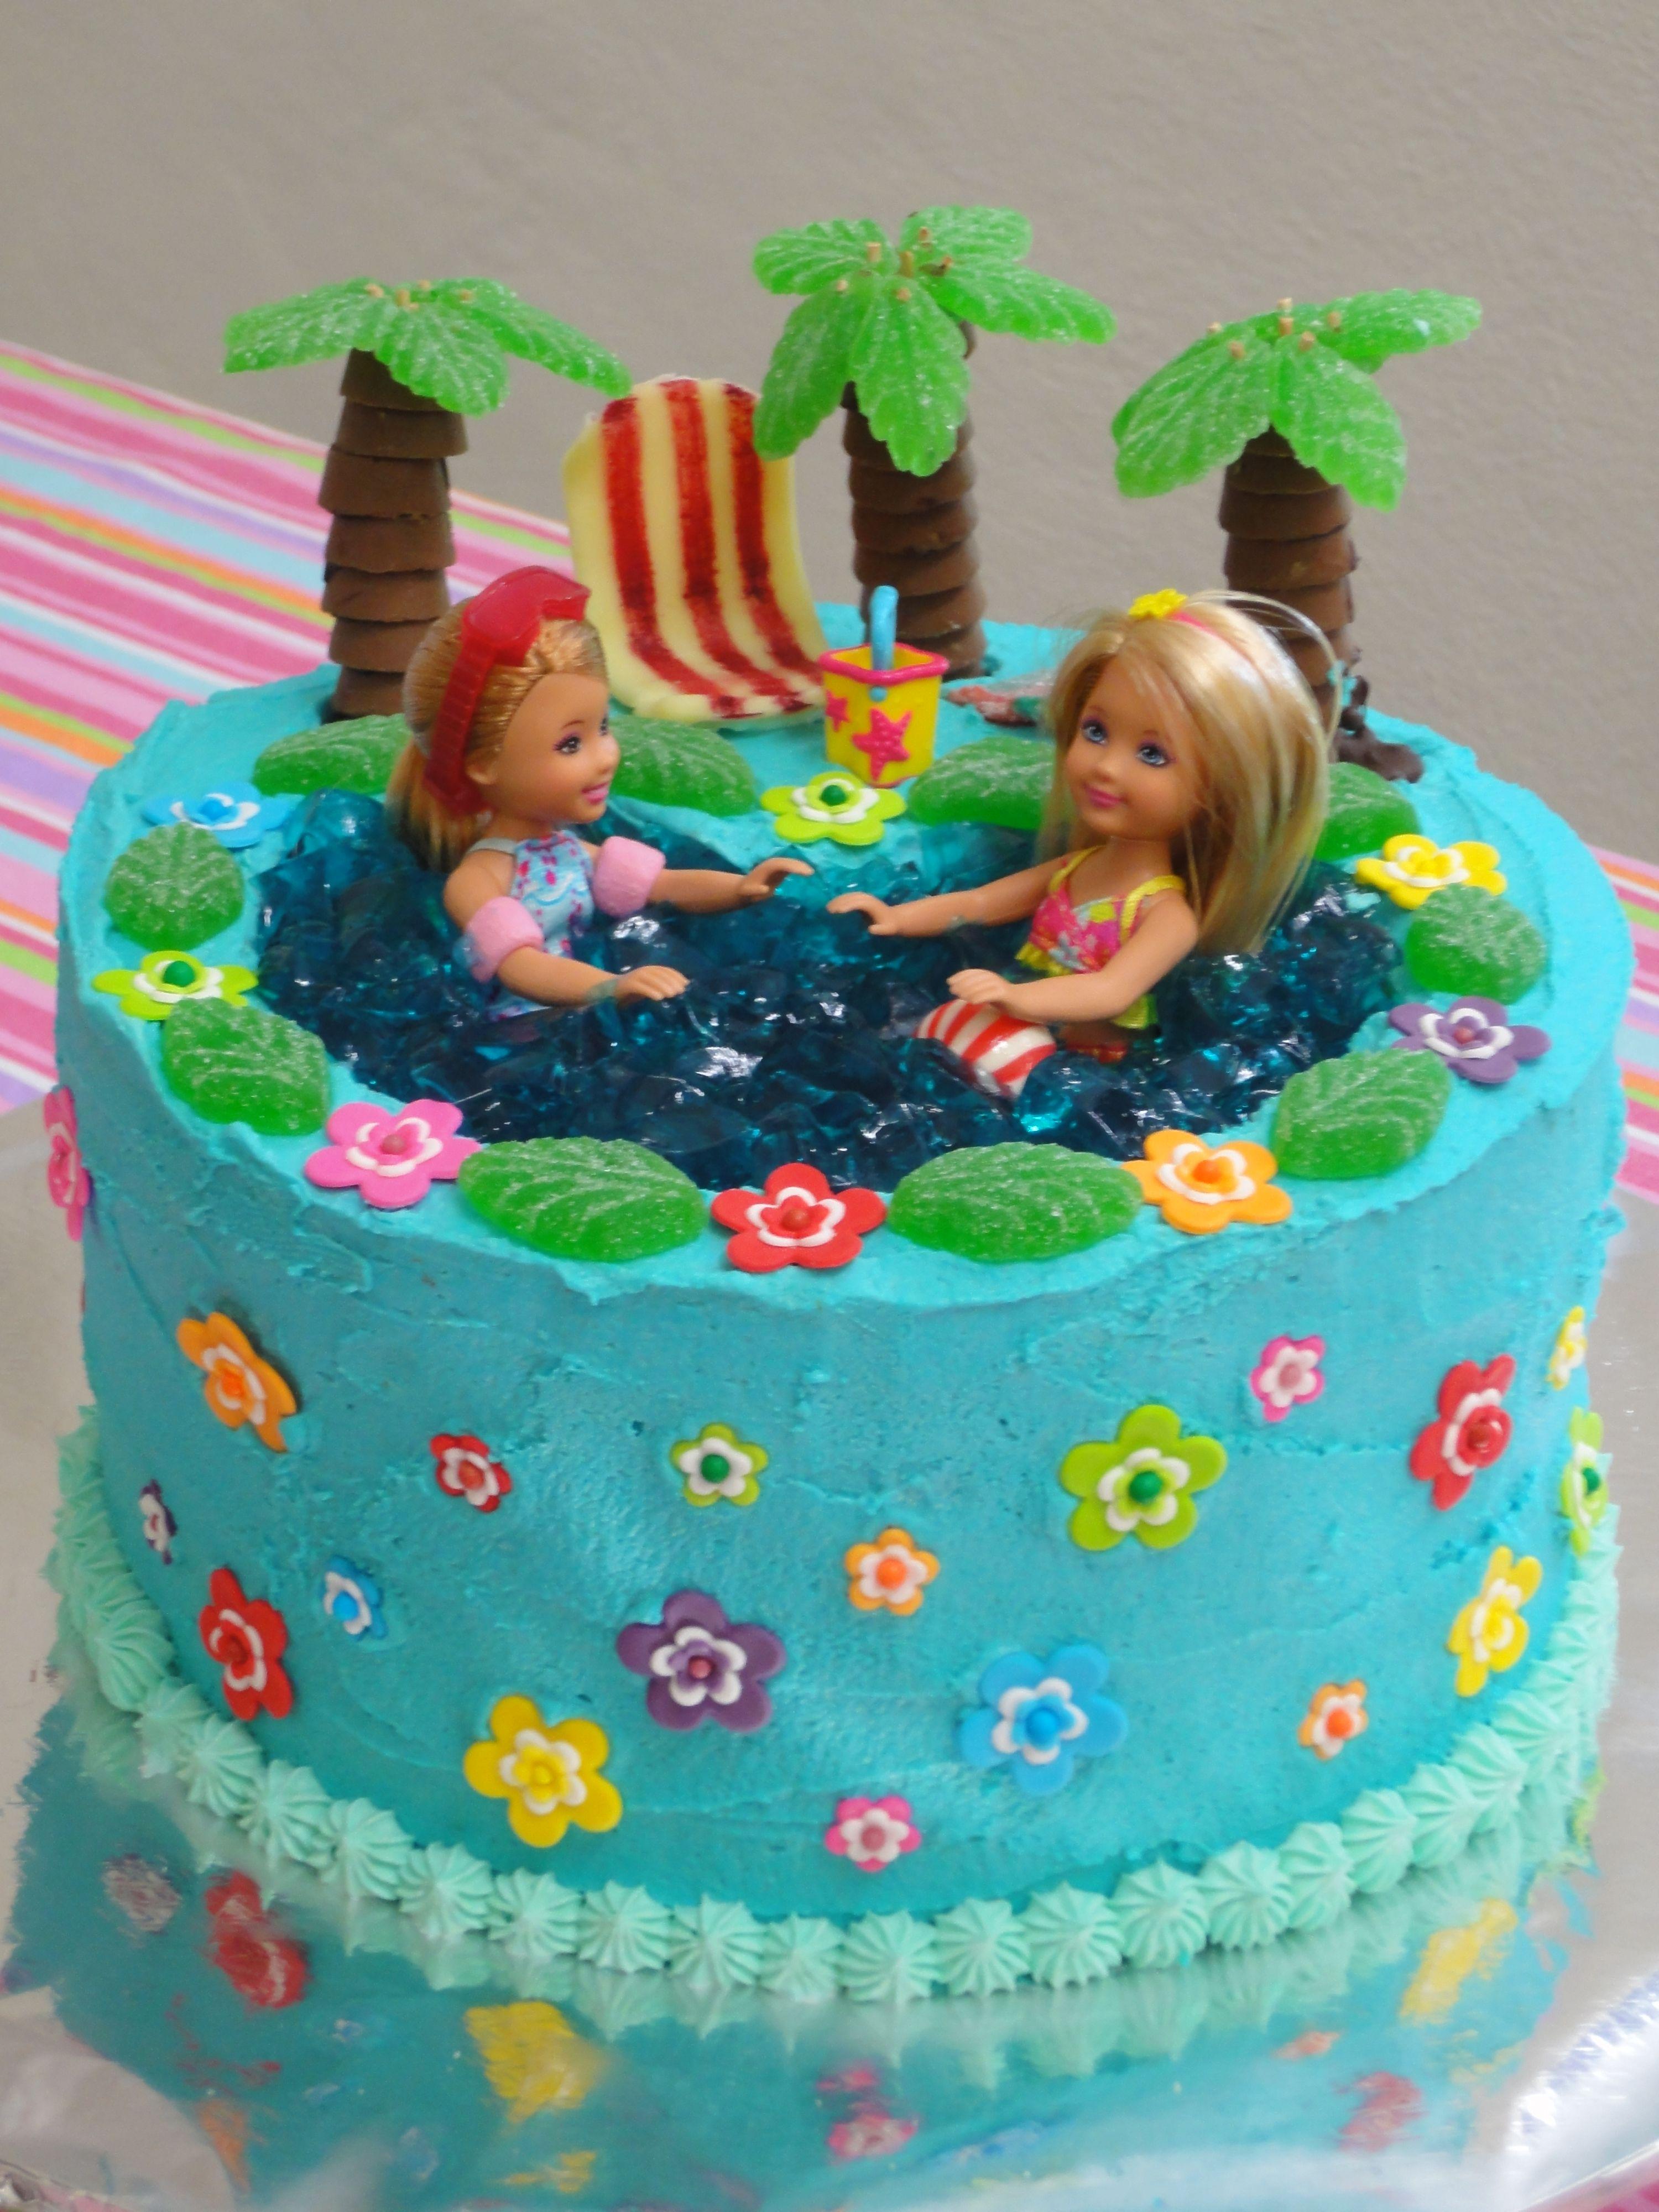 Barbie Pool Party Birthday Cake Made By Me Children 39 S Birthday Cakes Pinterest Birthday